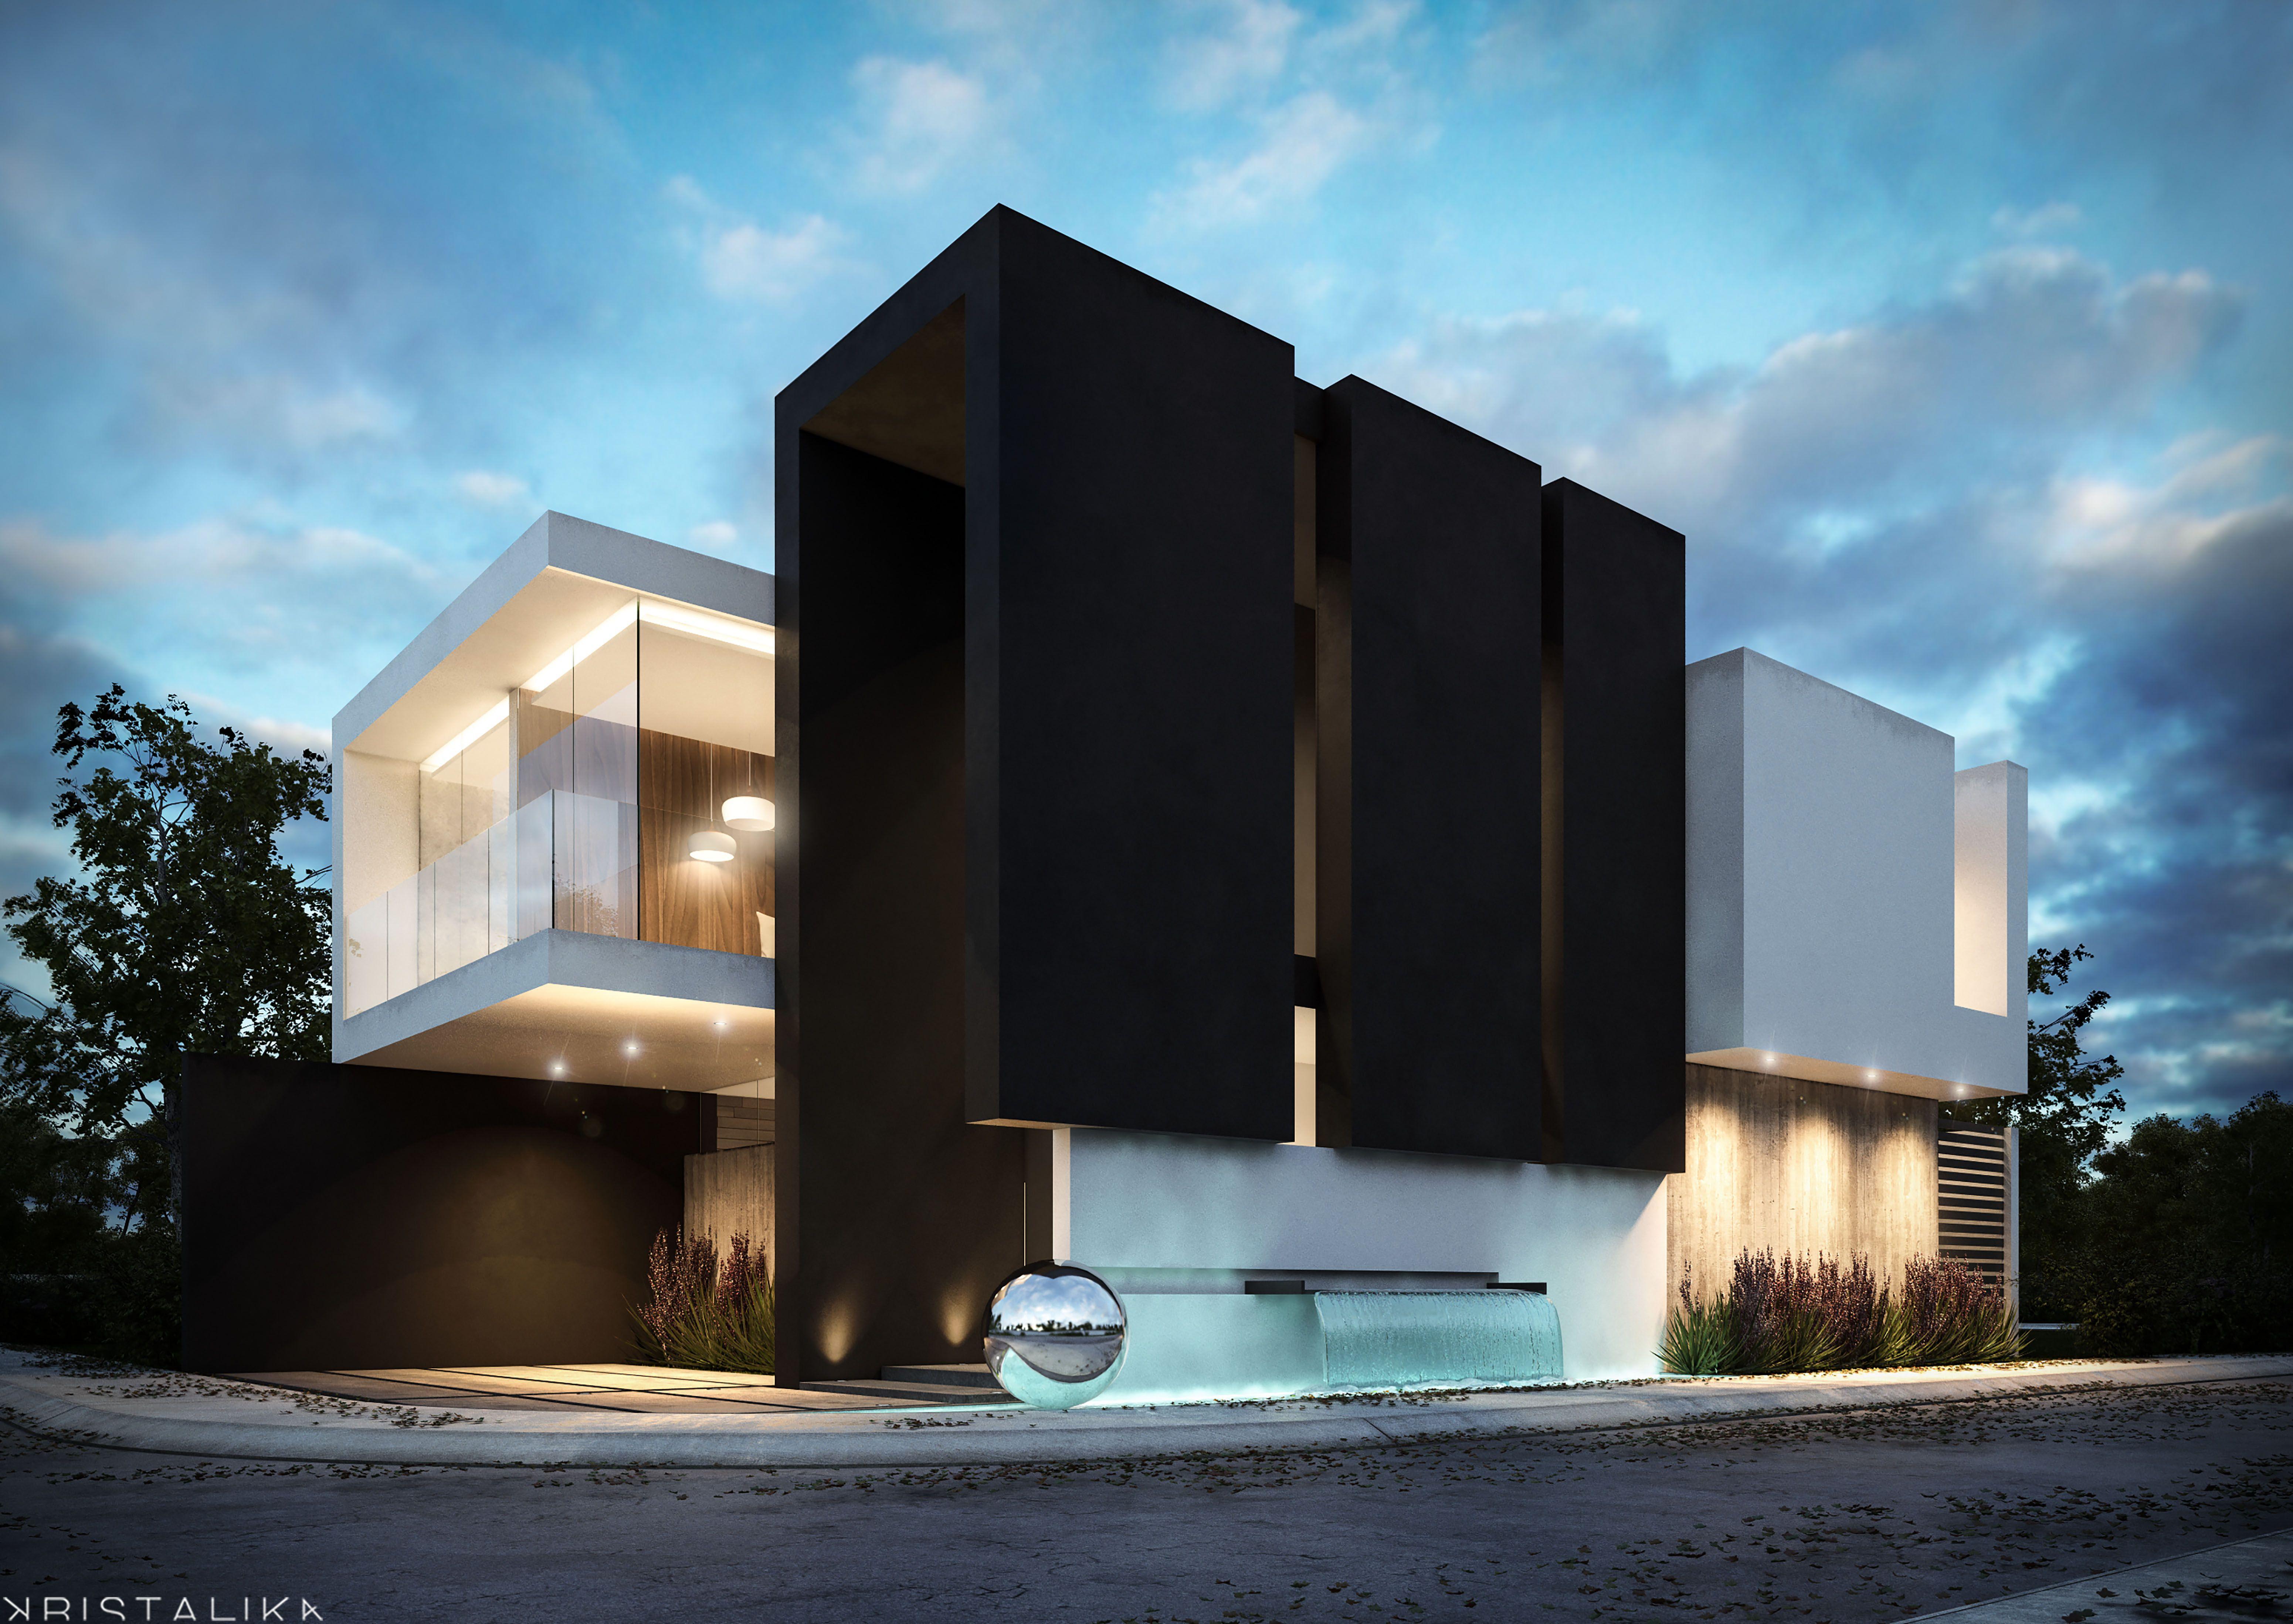 Livorno house kristalika arquitecture and interior for Edificios minimalistas fotos